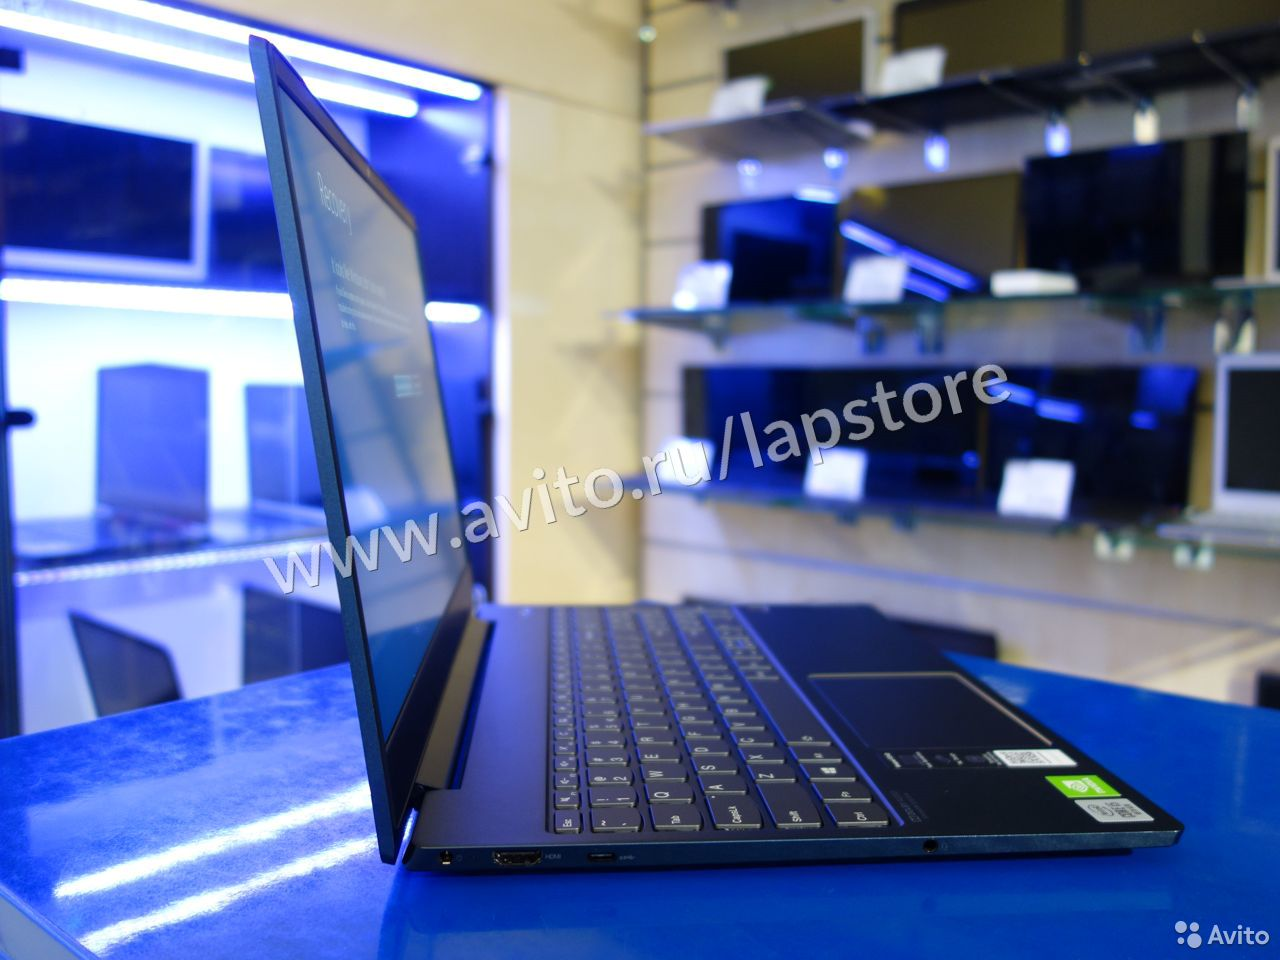 Ноутбук Lenovo S540 i5-10210/8G/512G SSD/MX250 2GB  84012422018 купить 2